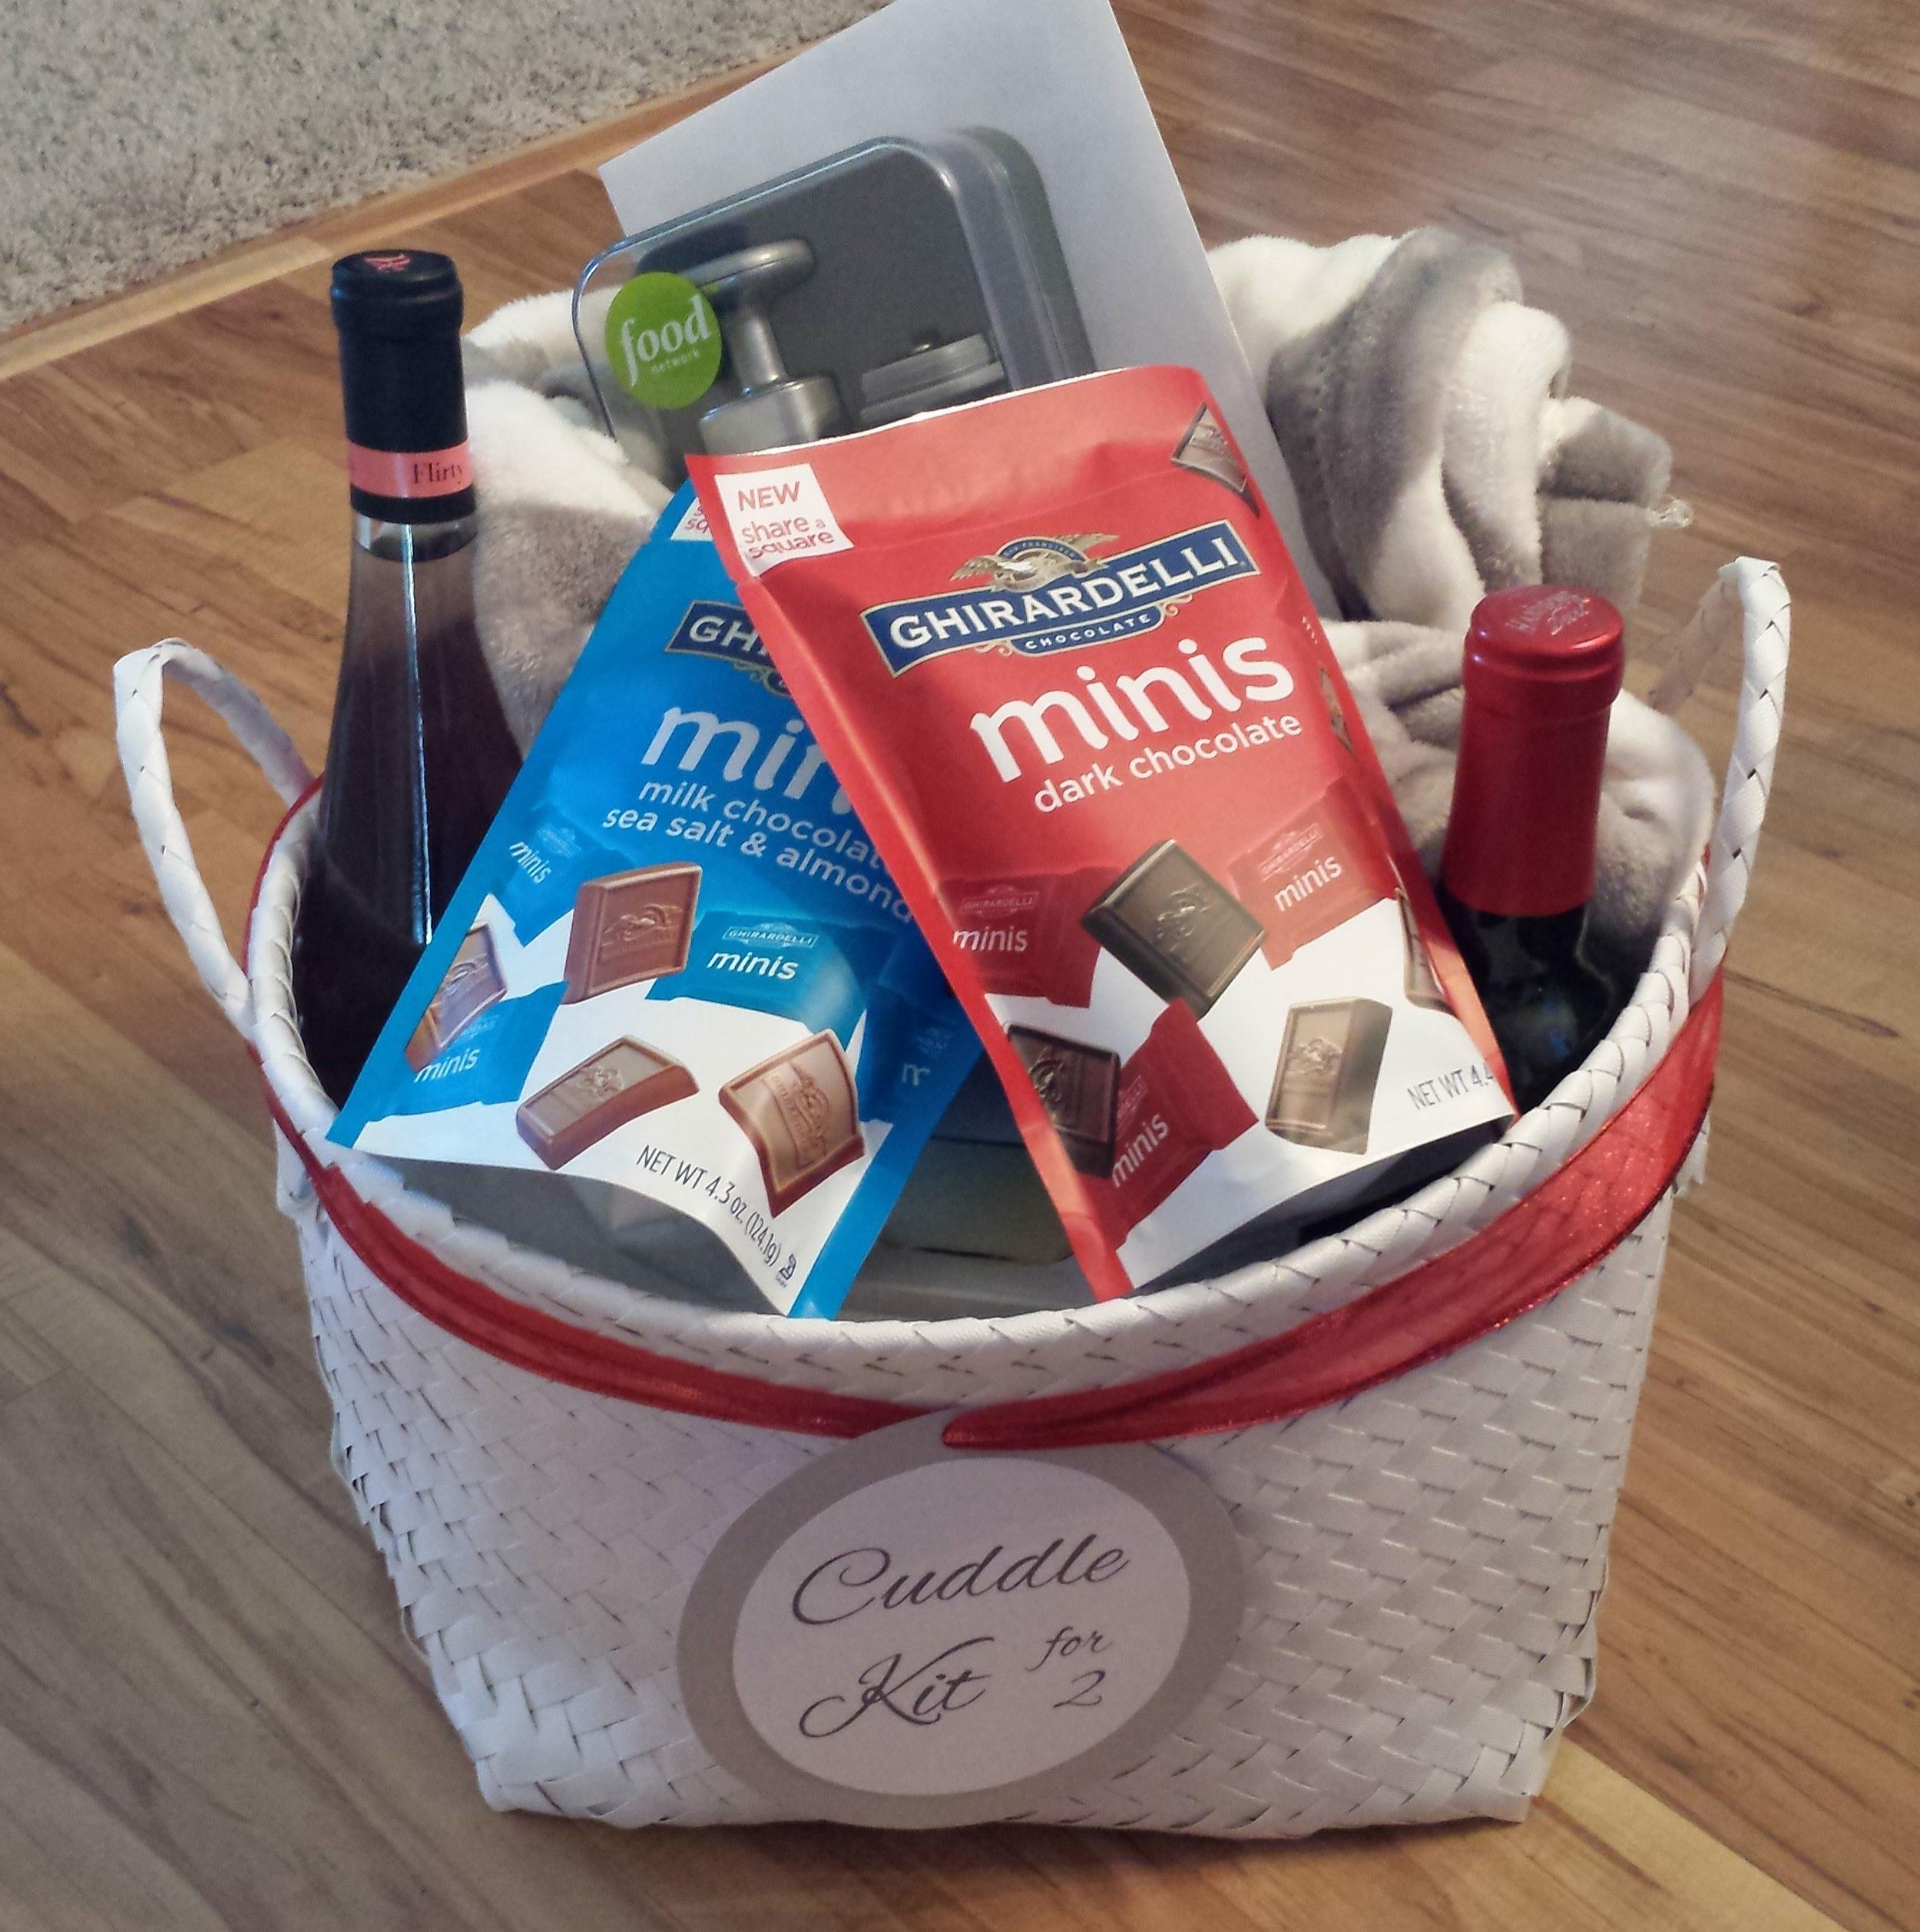 cuddle kit for 2 bridal shower wedding gift